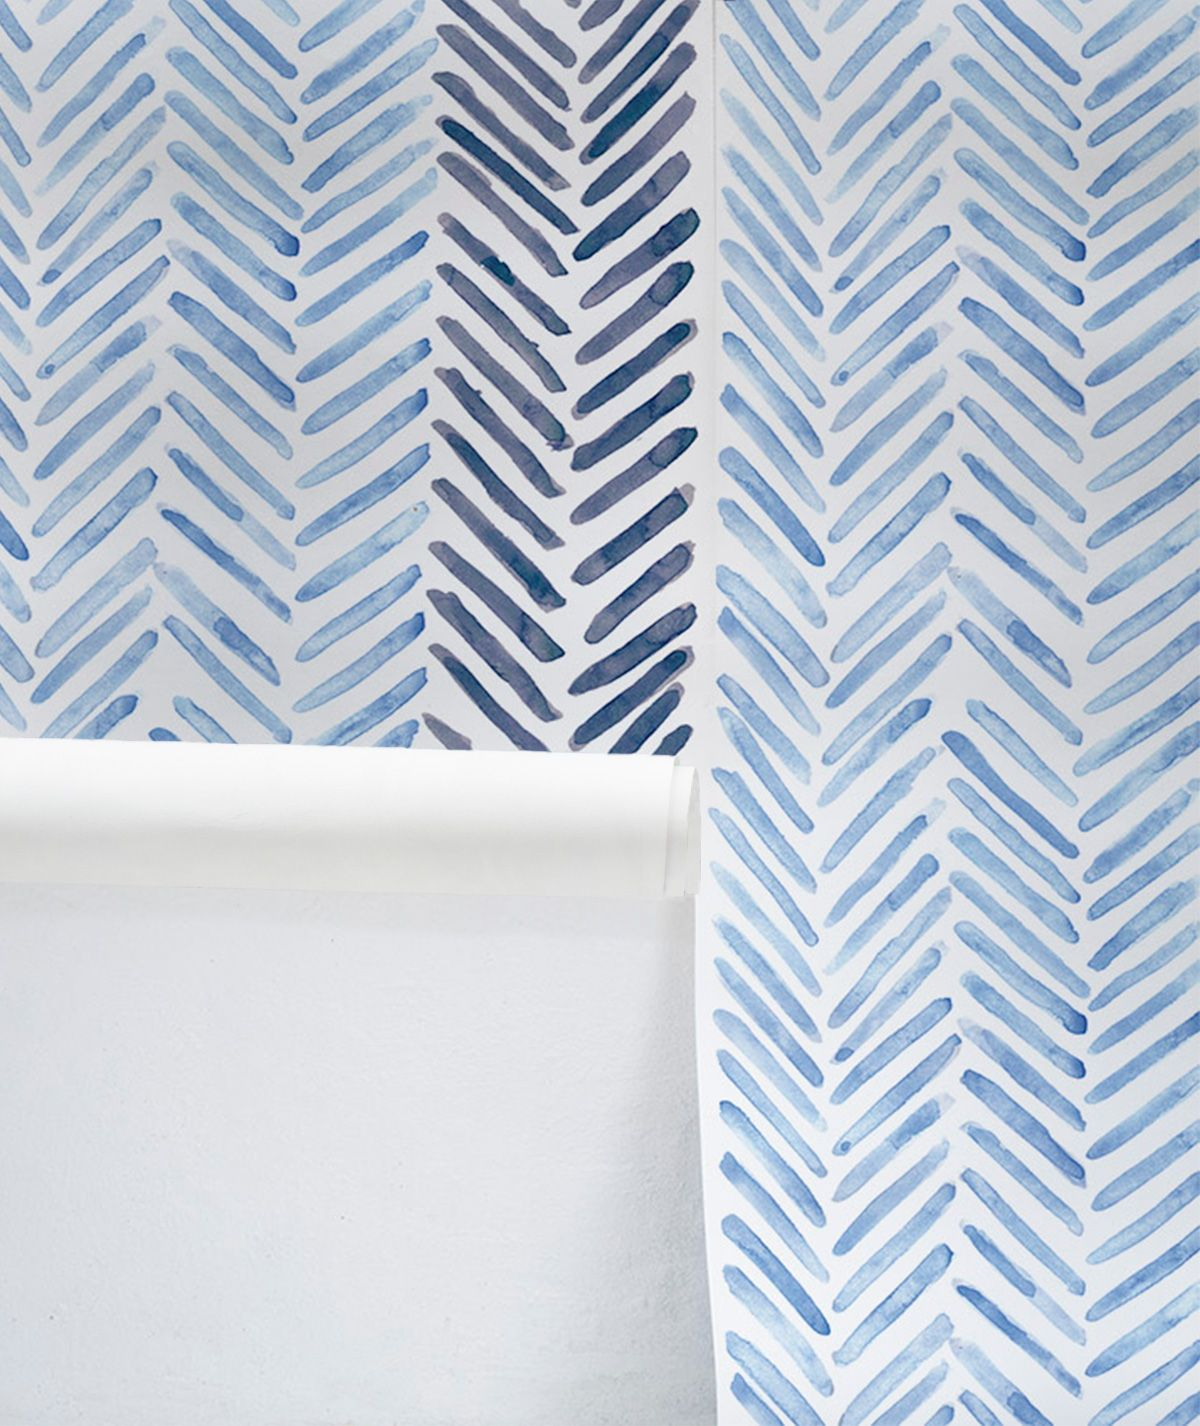 Herringbone Wallpaper Cobalt In 2021 Herringbone Wallpaper Striped Wallpaper Wallpaper